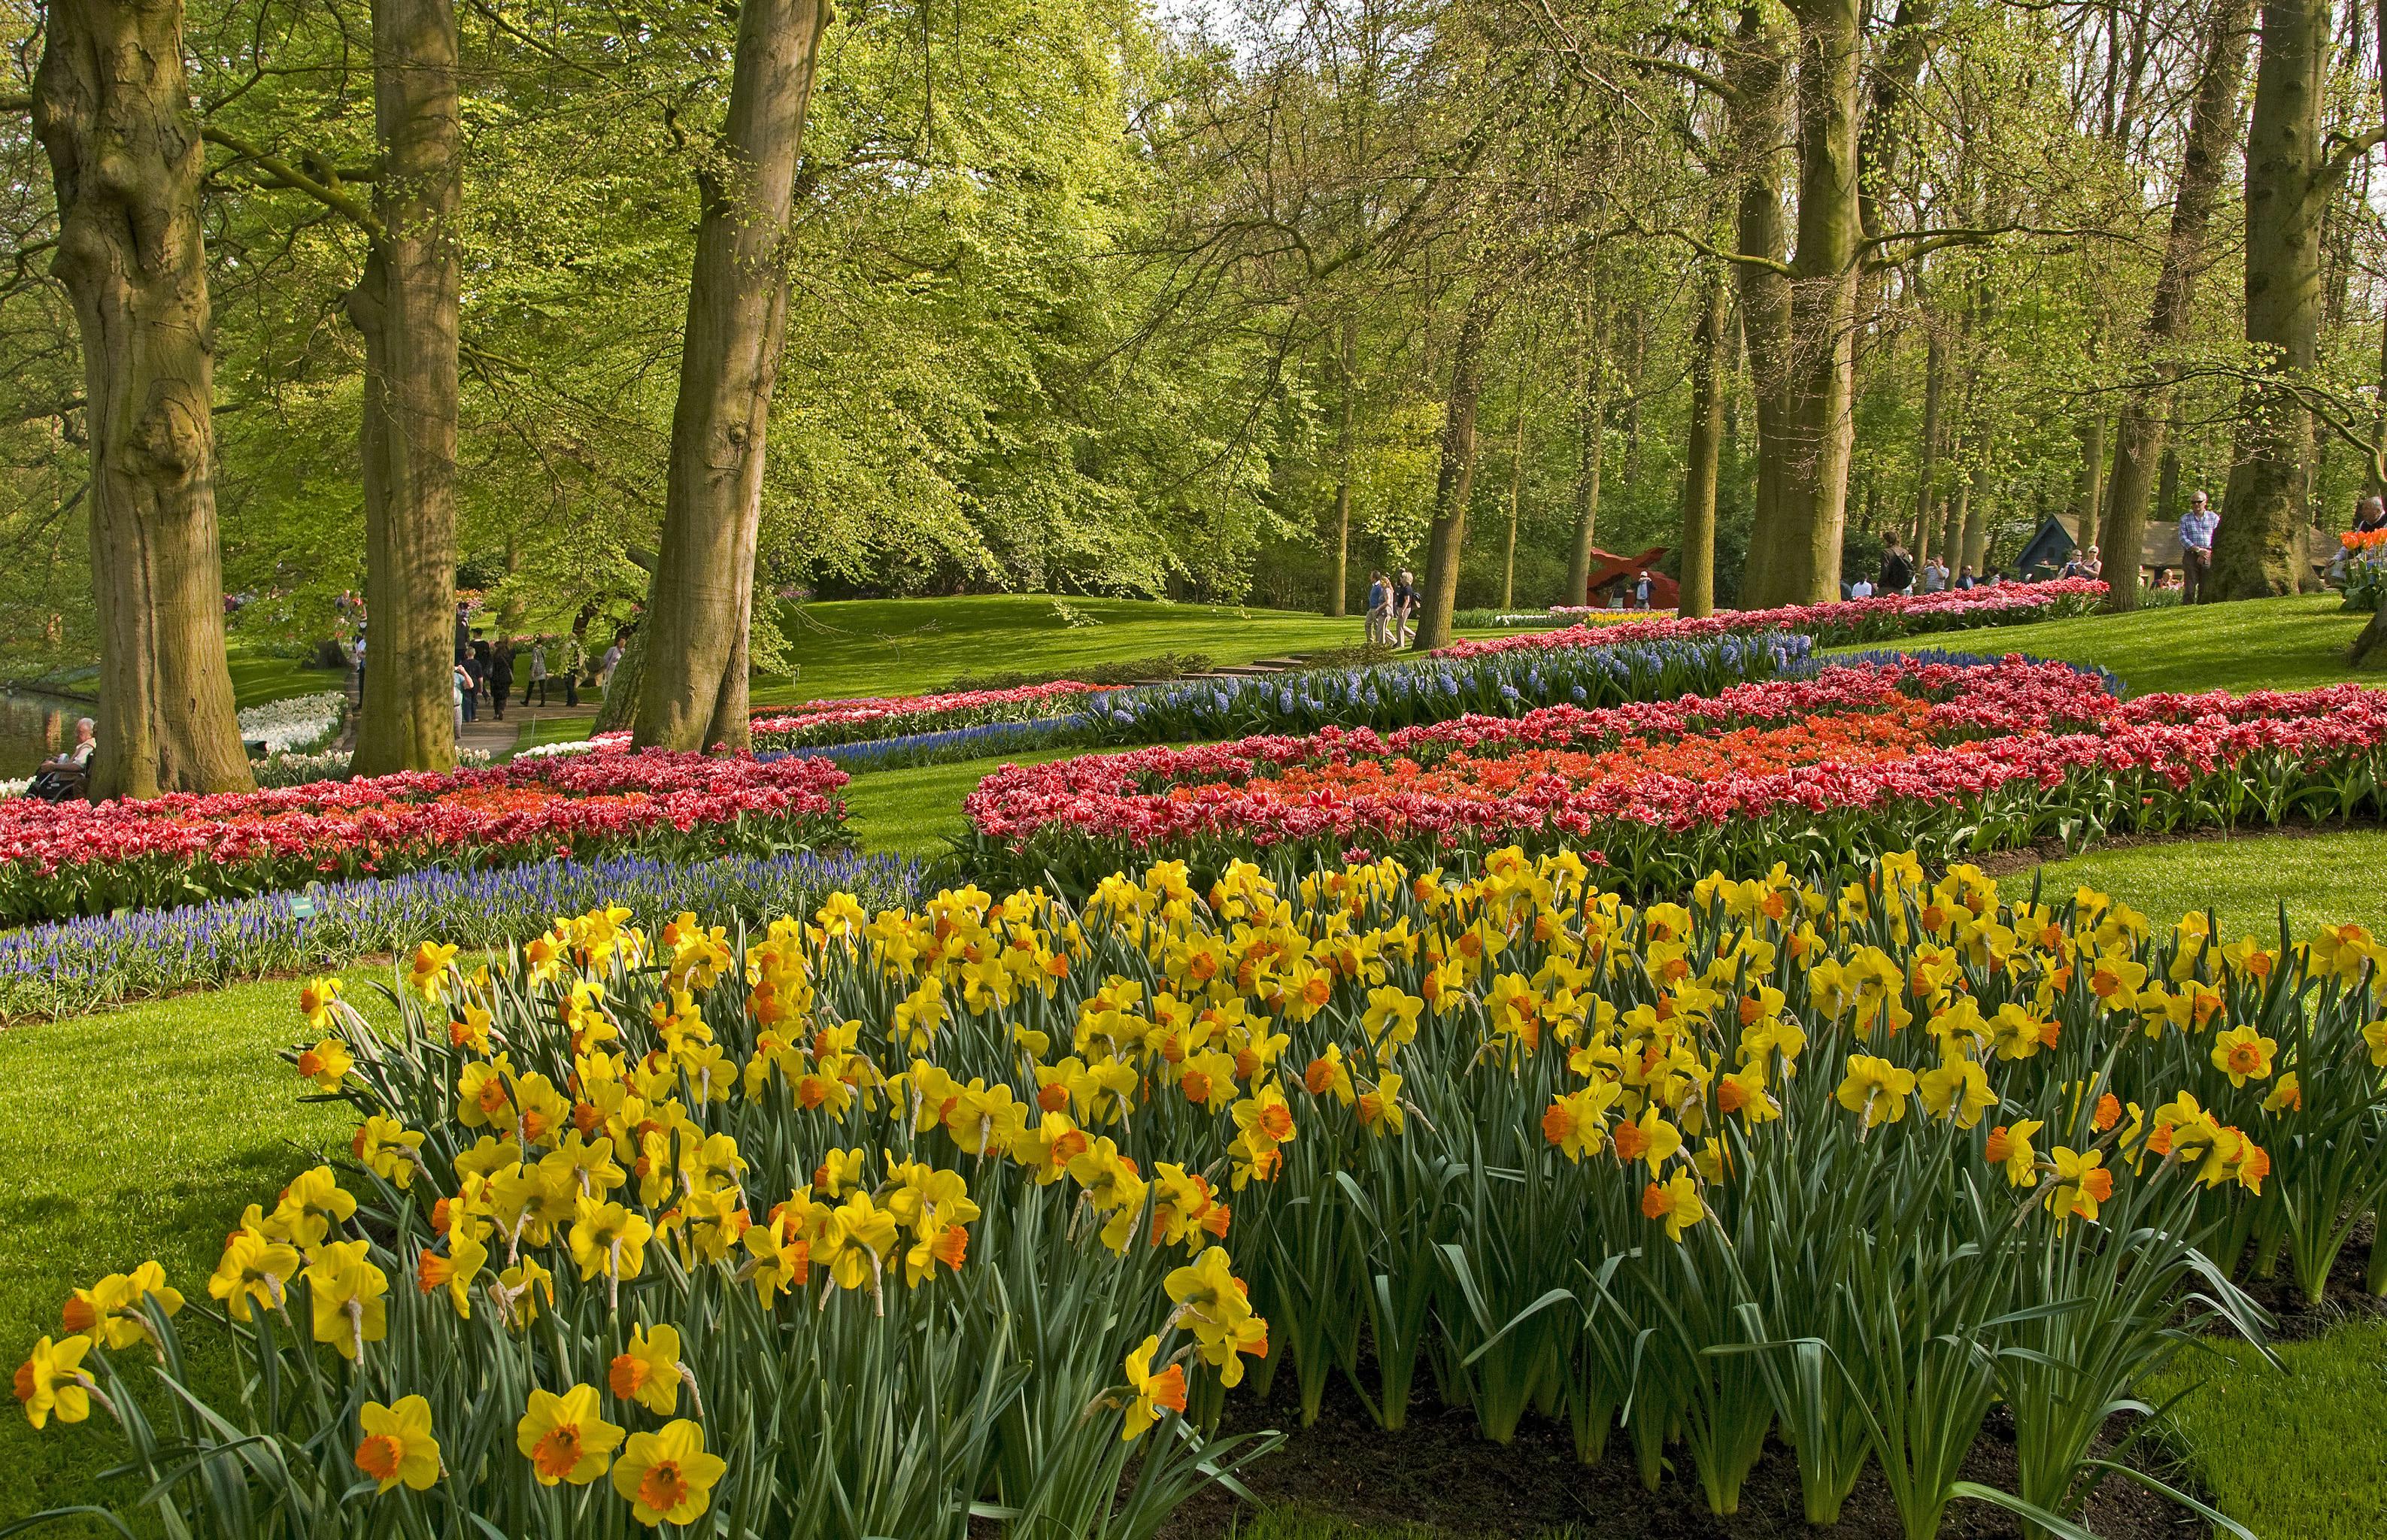 daffodils-photo-92